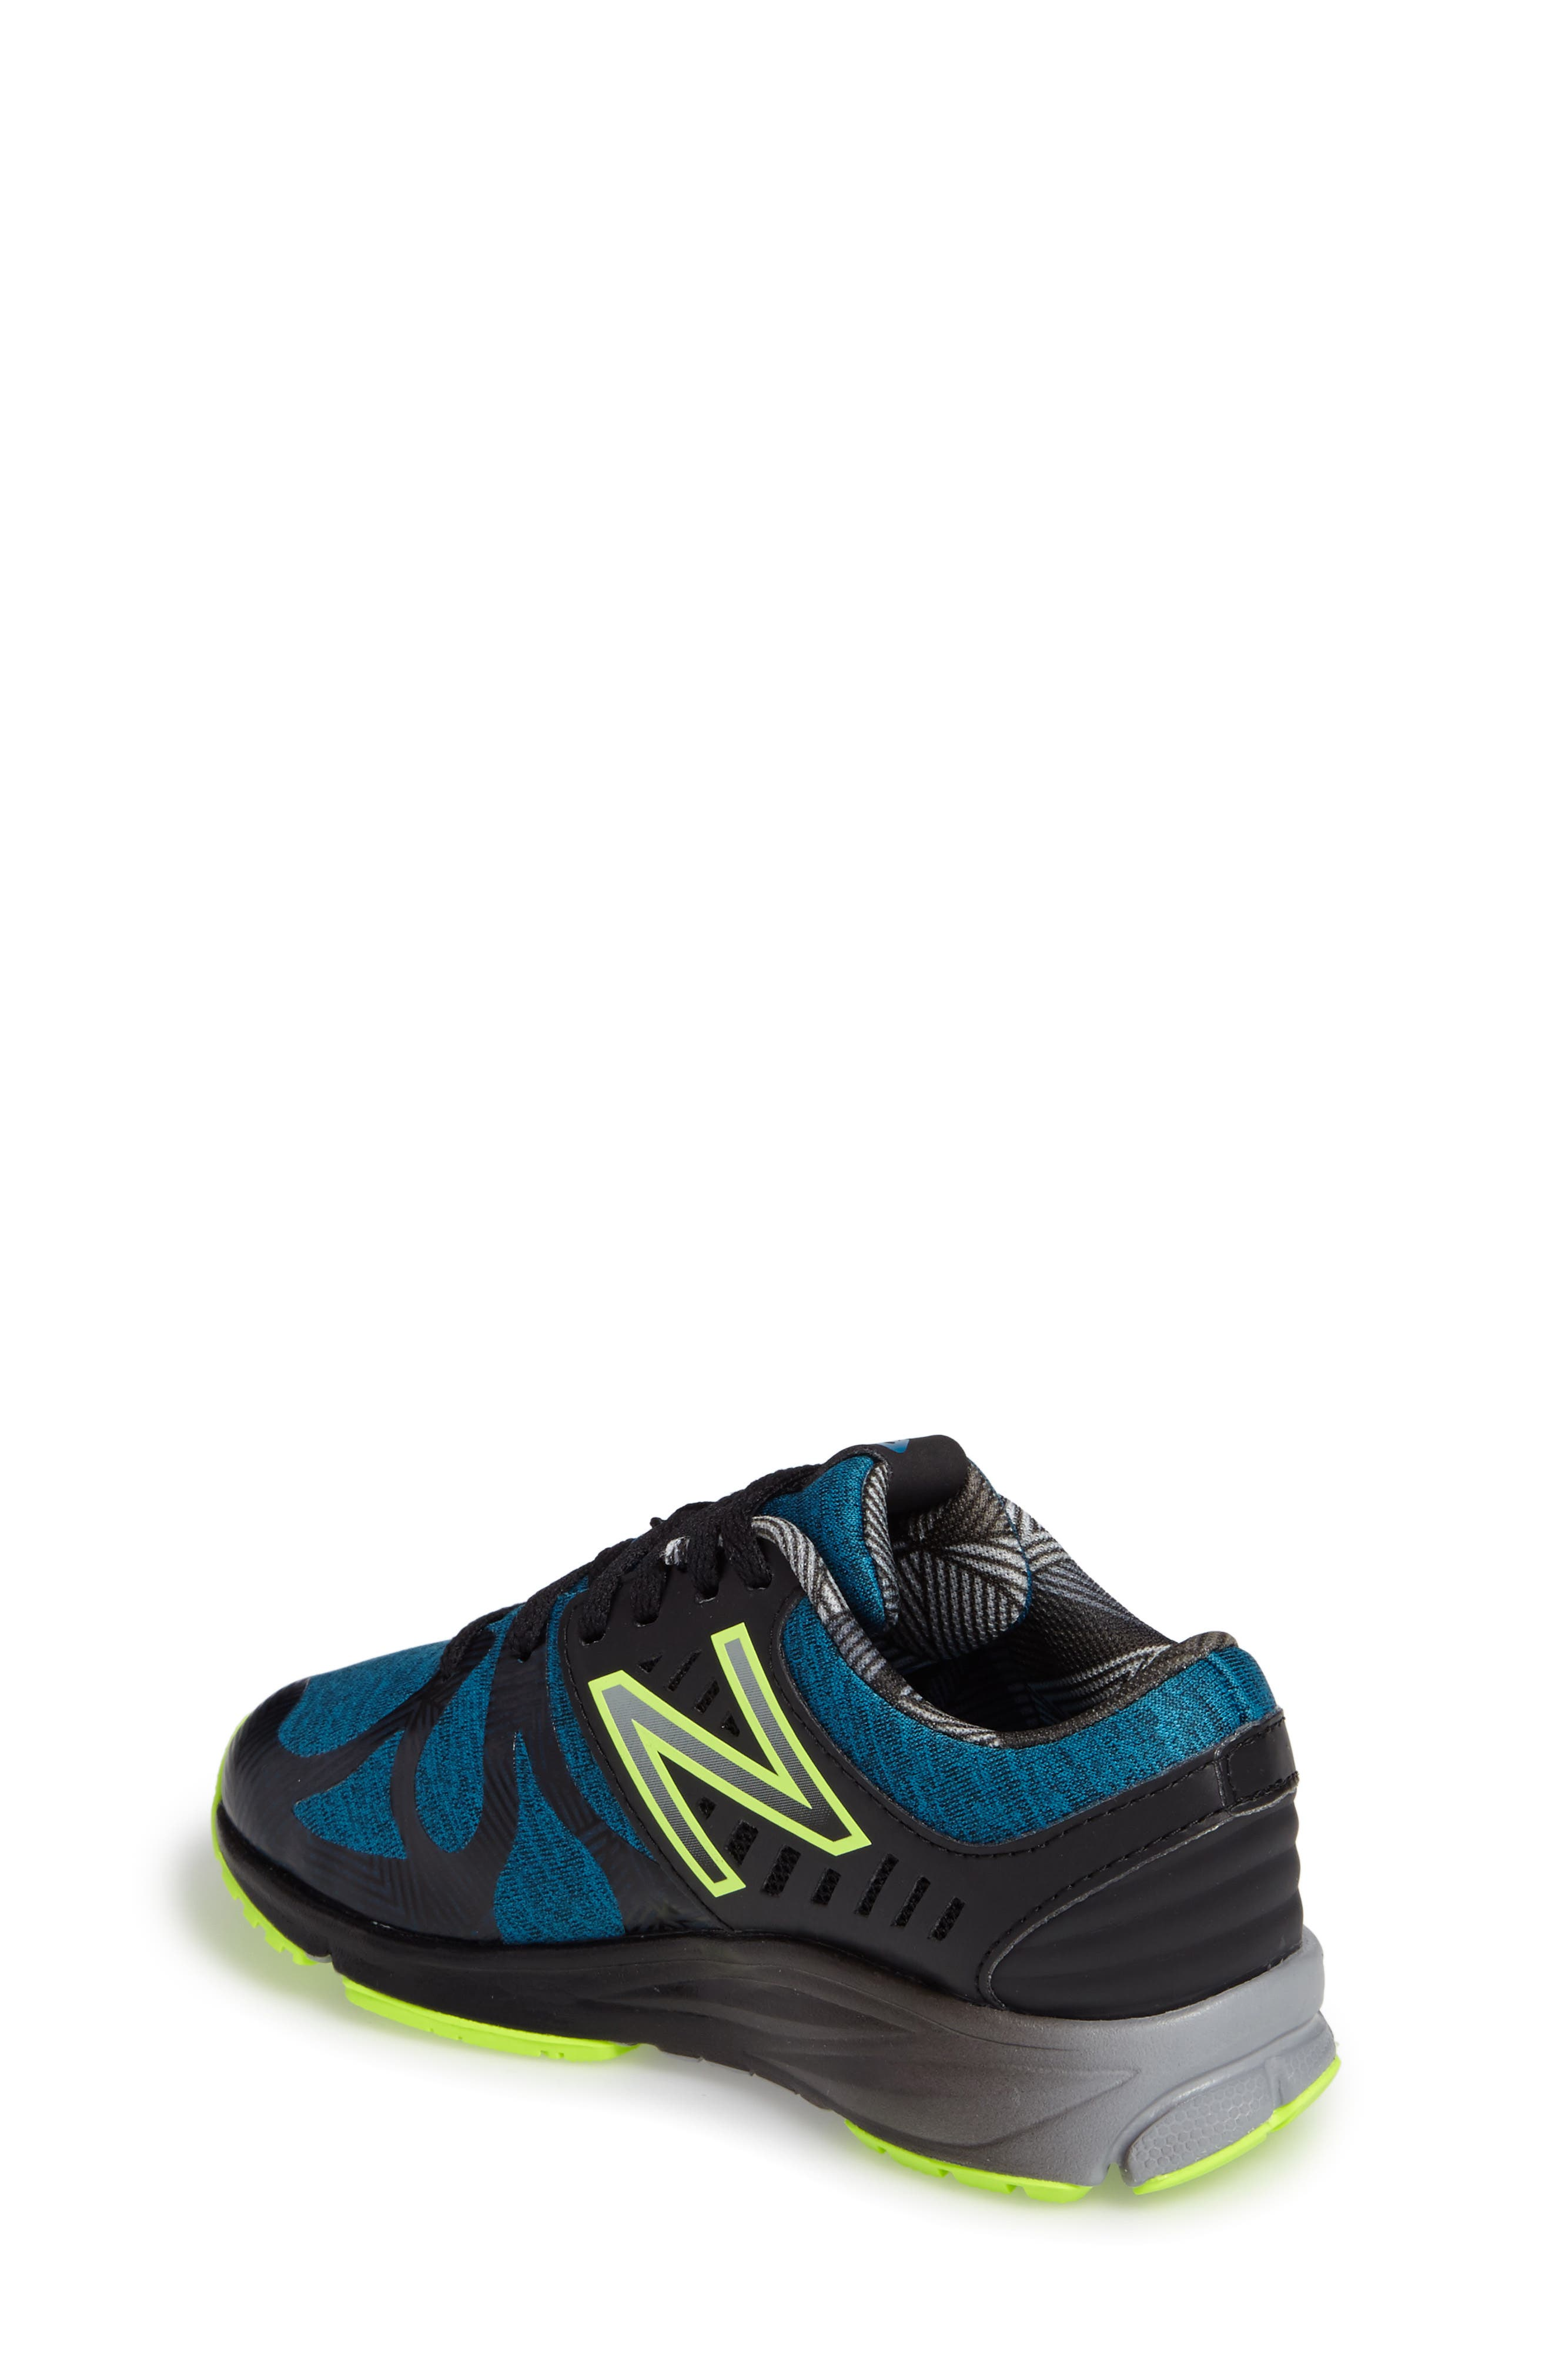 200 Electric Rainbow Athletic Shoe,                             Alternate thumbnail 2, color,                             407